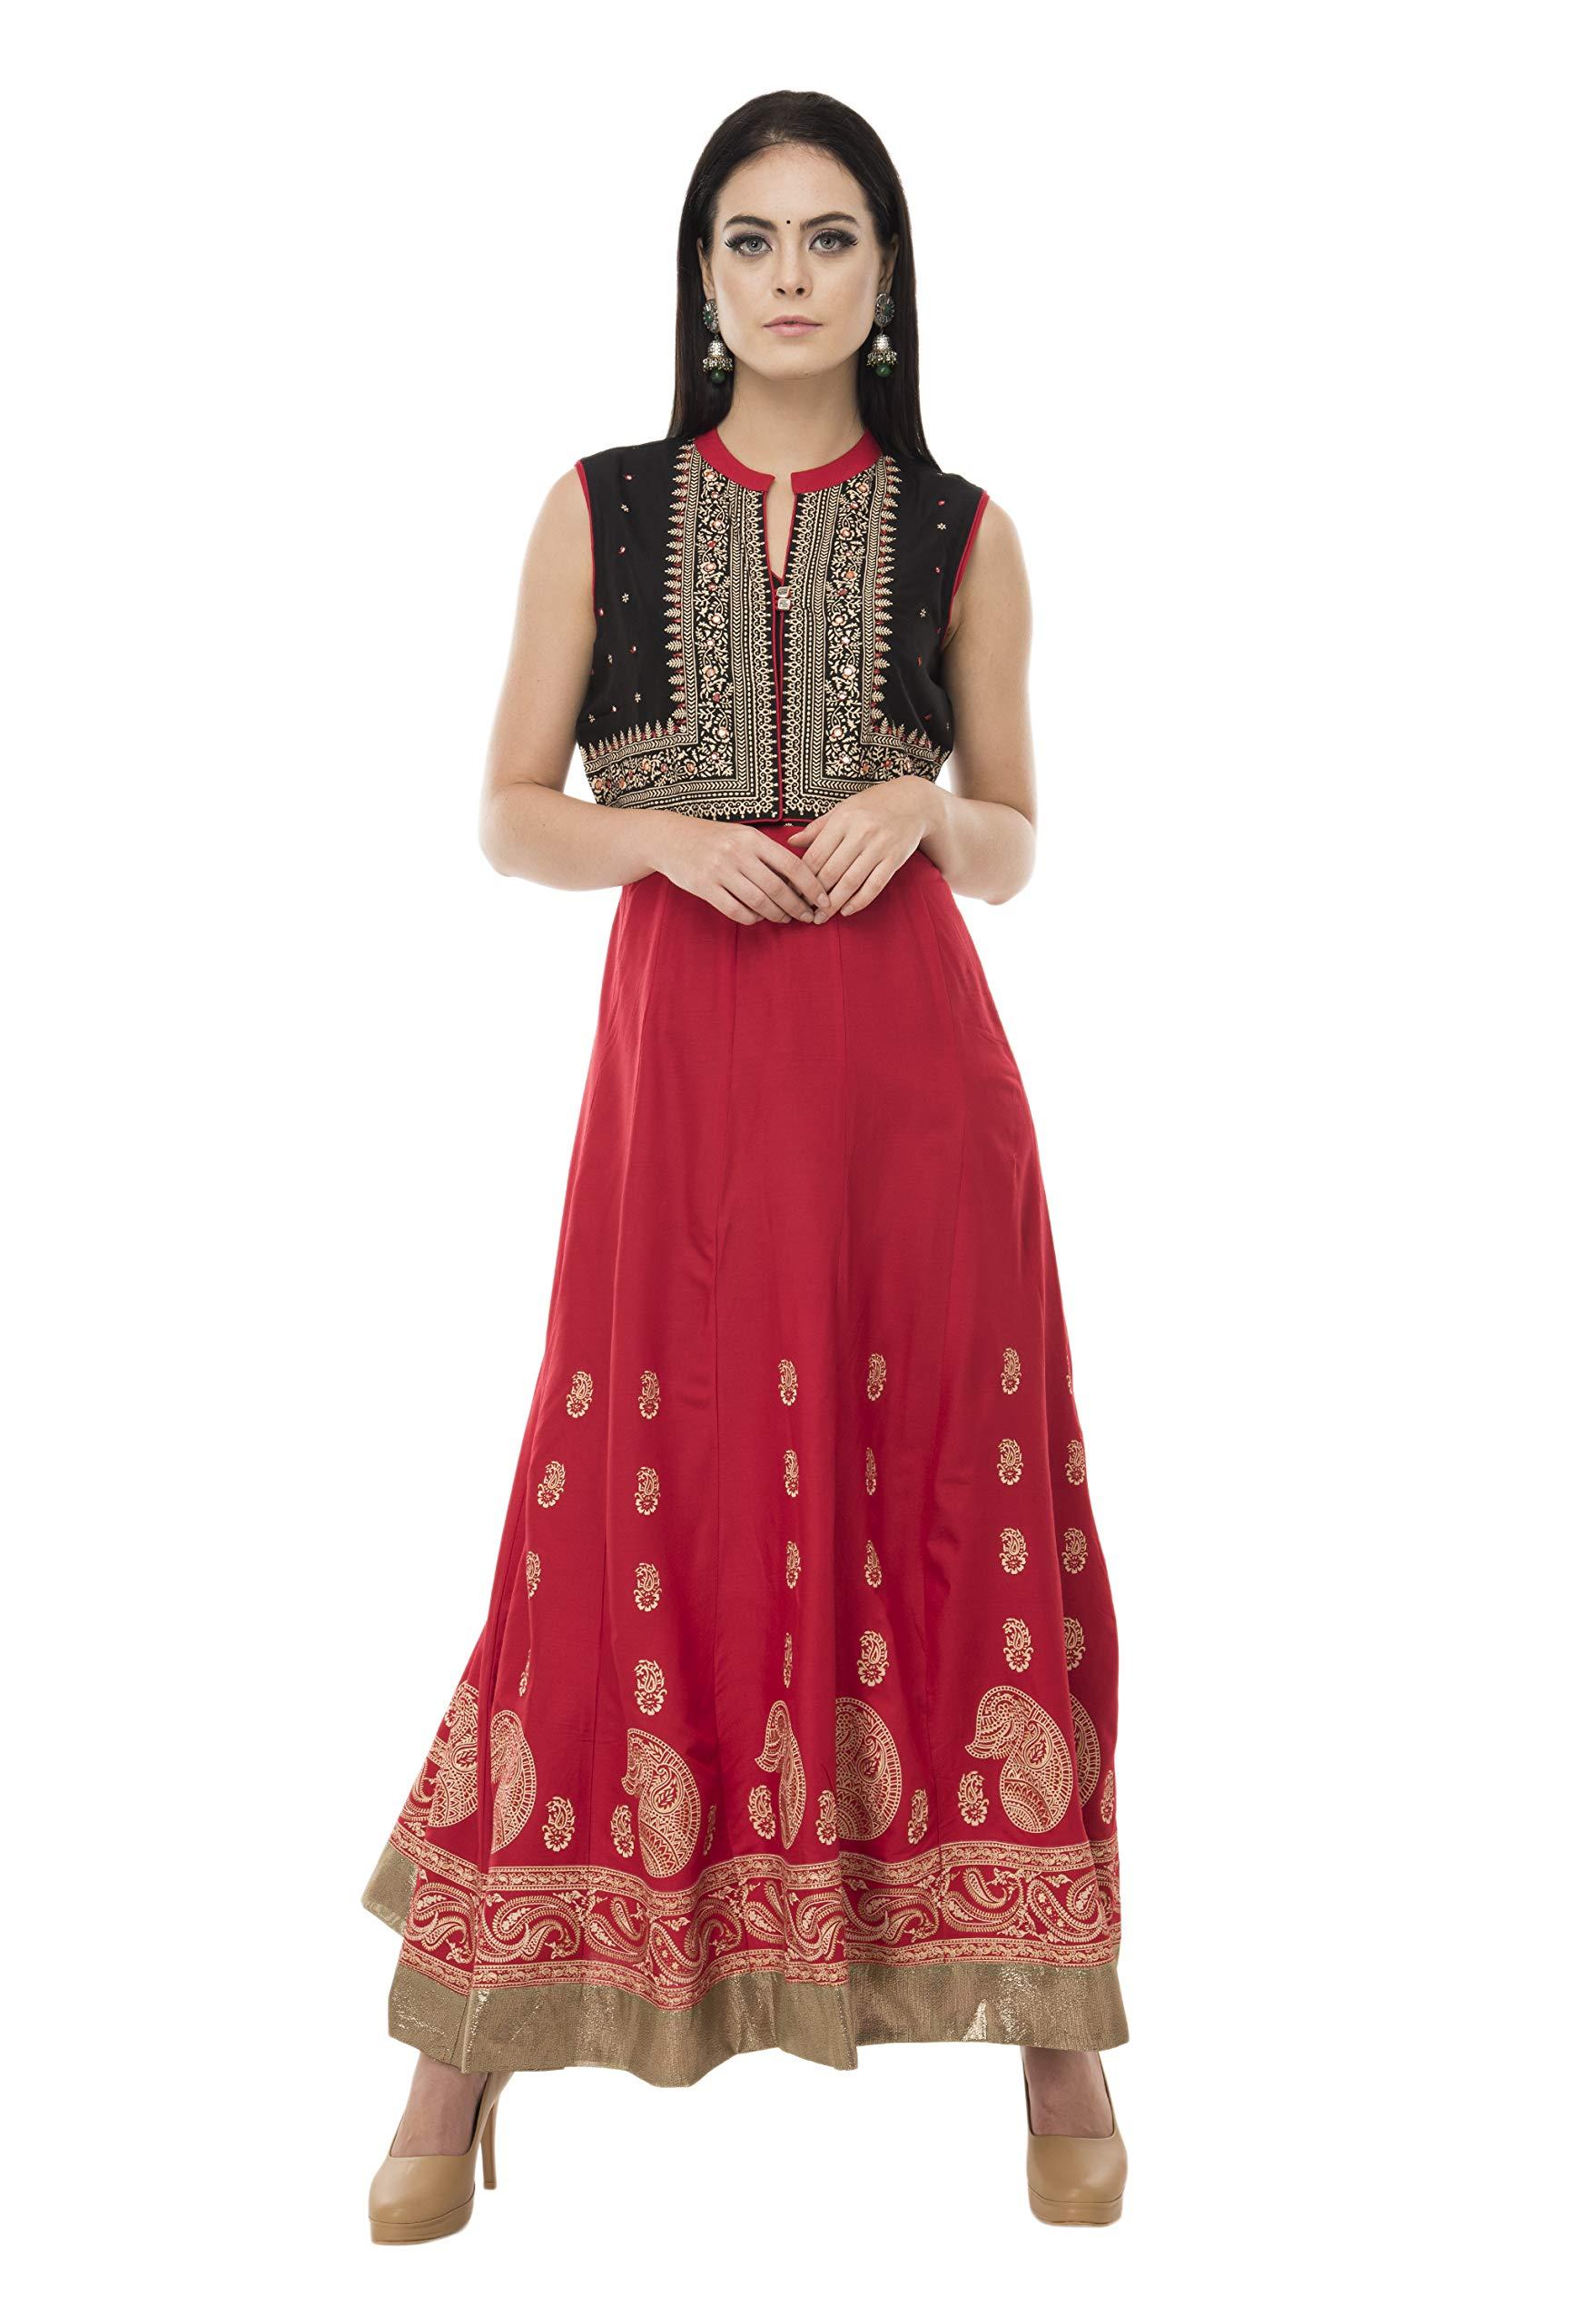 SABHYATA Womens Kurta Indian Kurtis for Women Cotton Casual Tunic Top Long Dress Large Black/RED